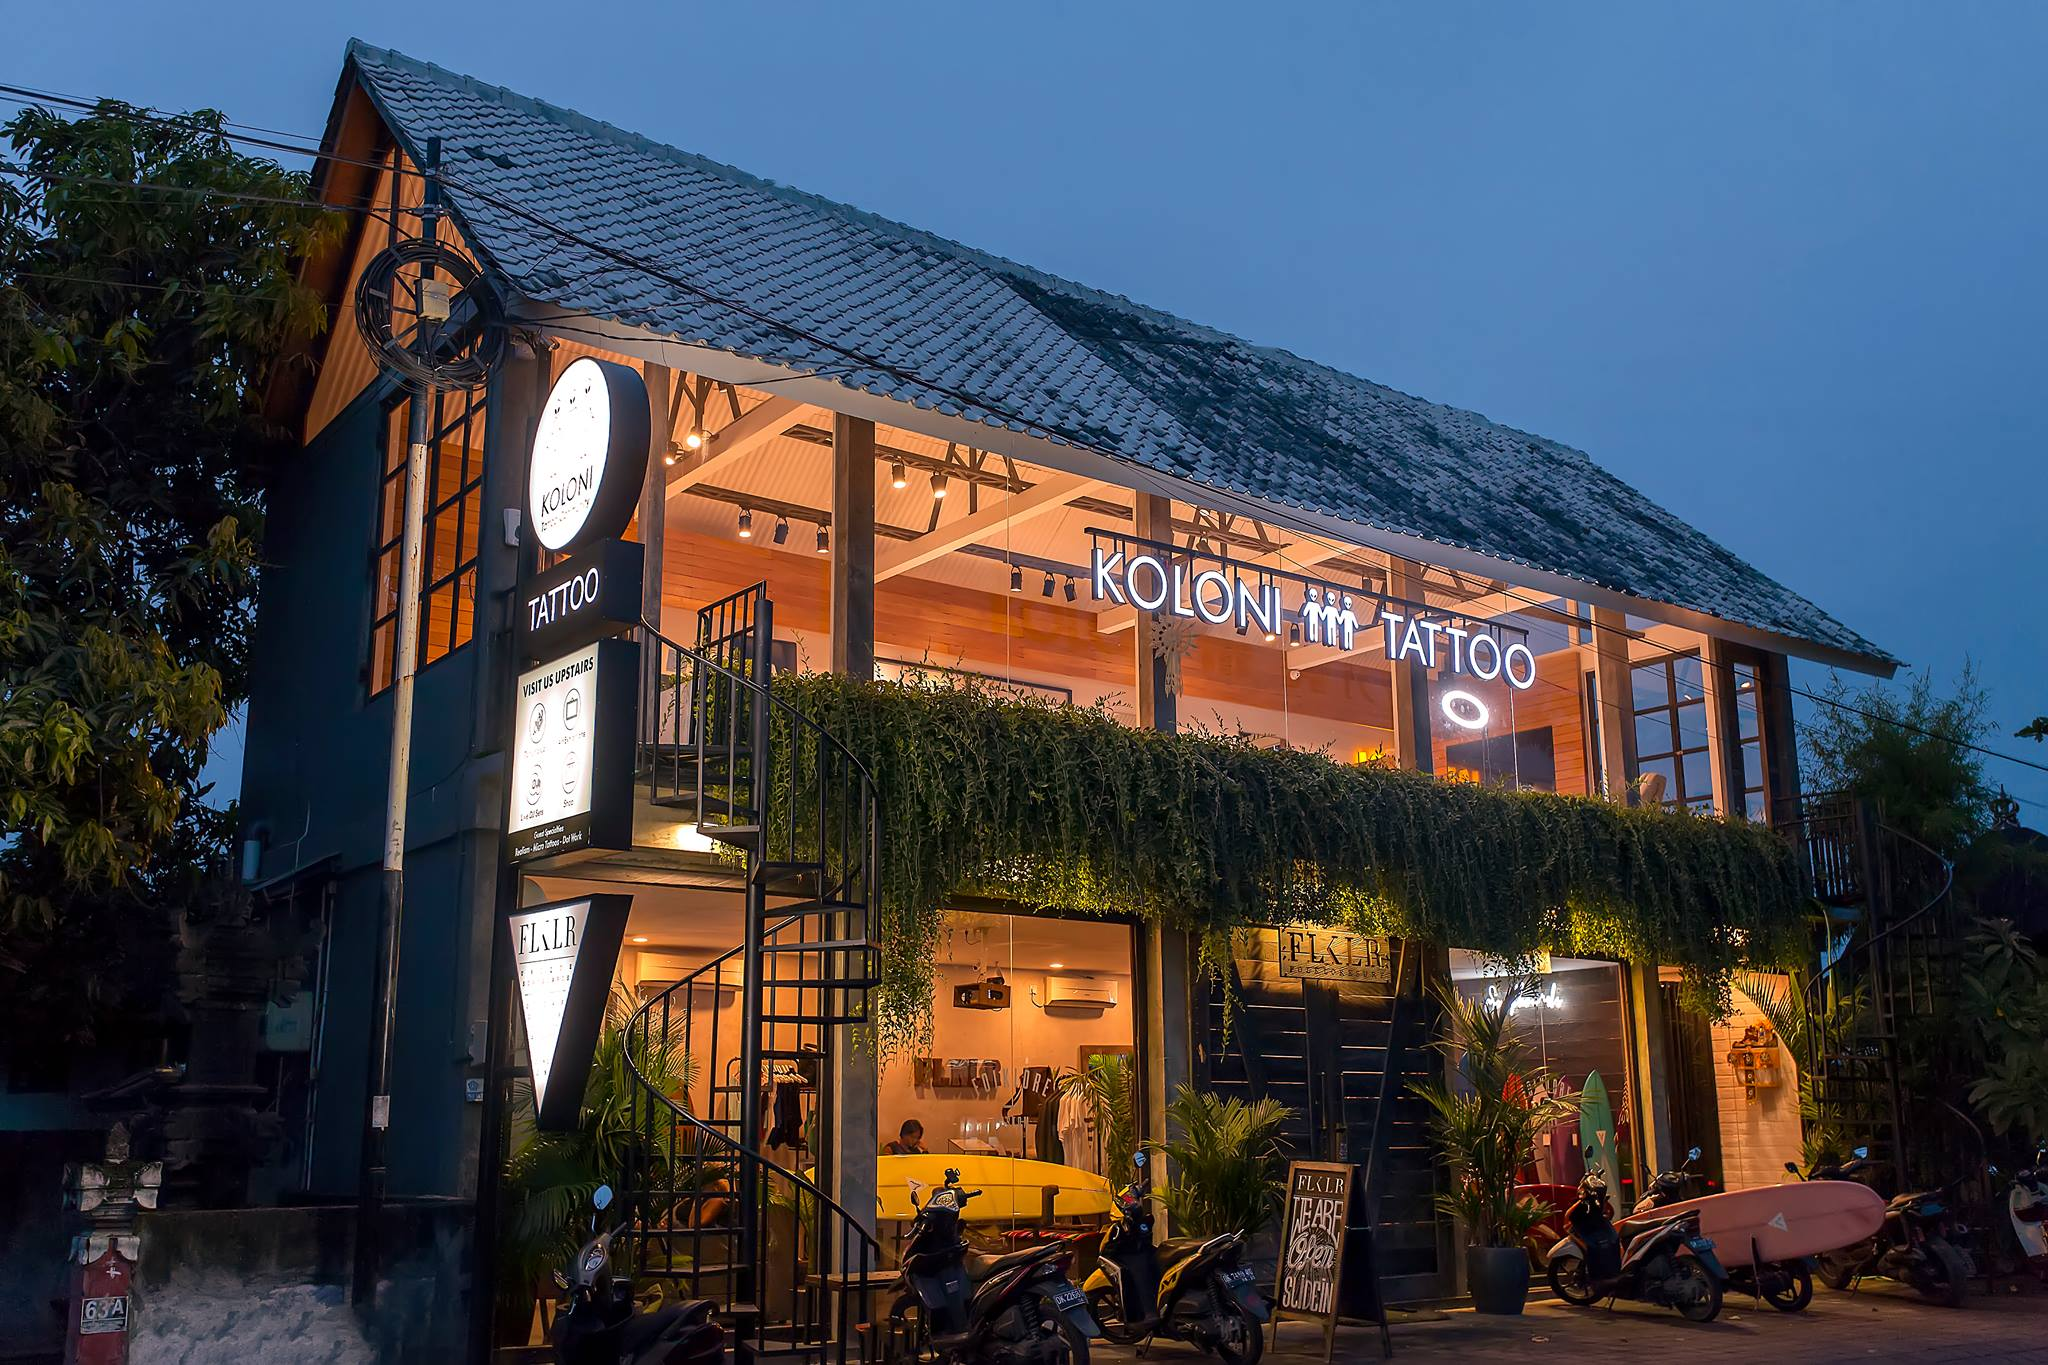 The Best Tattoo Shops In Bali Asia Holiday Retreats Luxury Villas